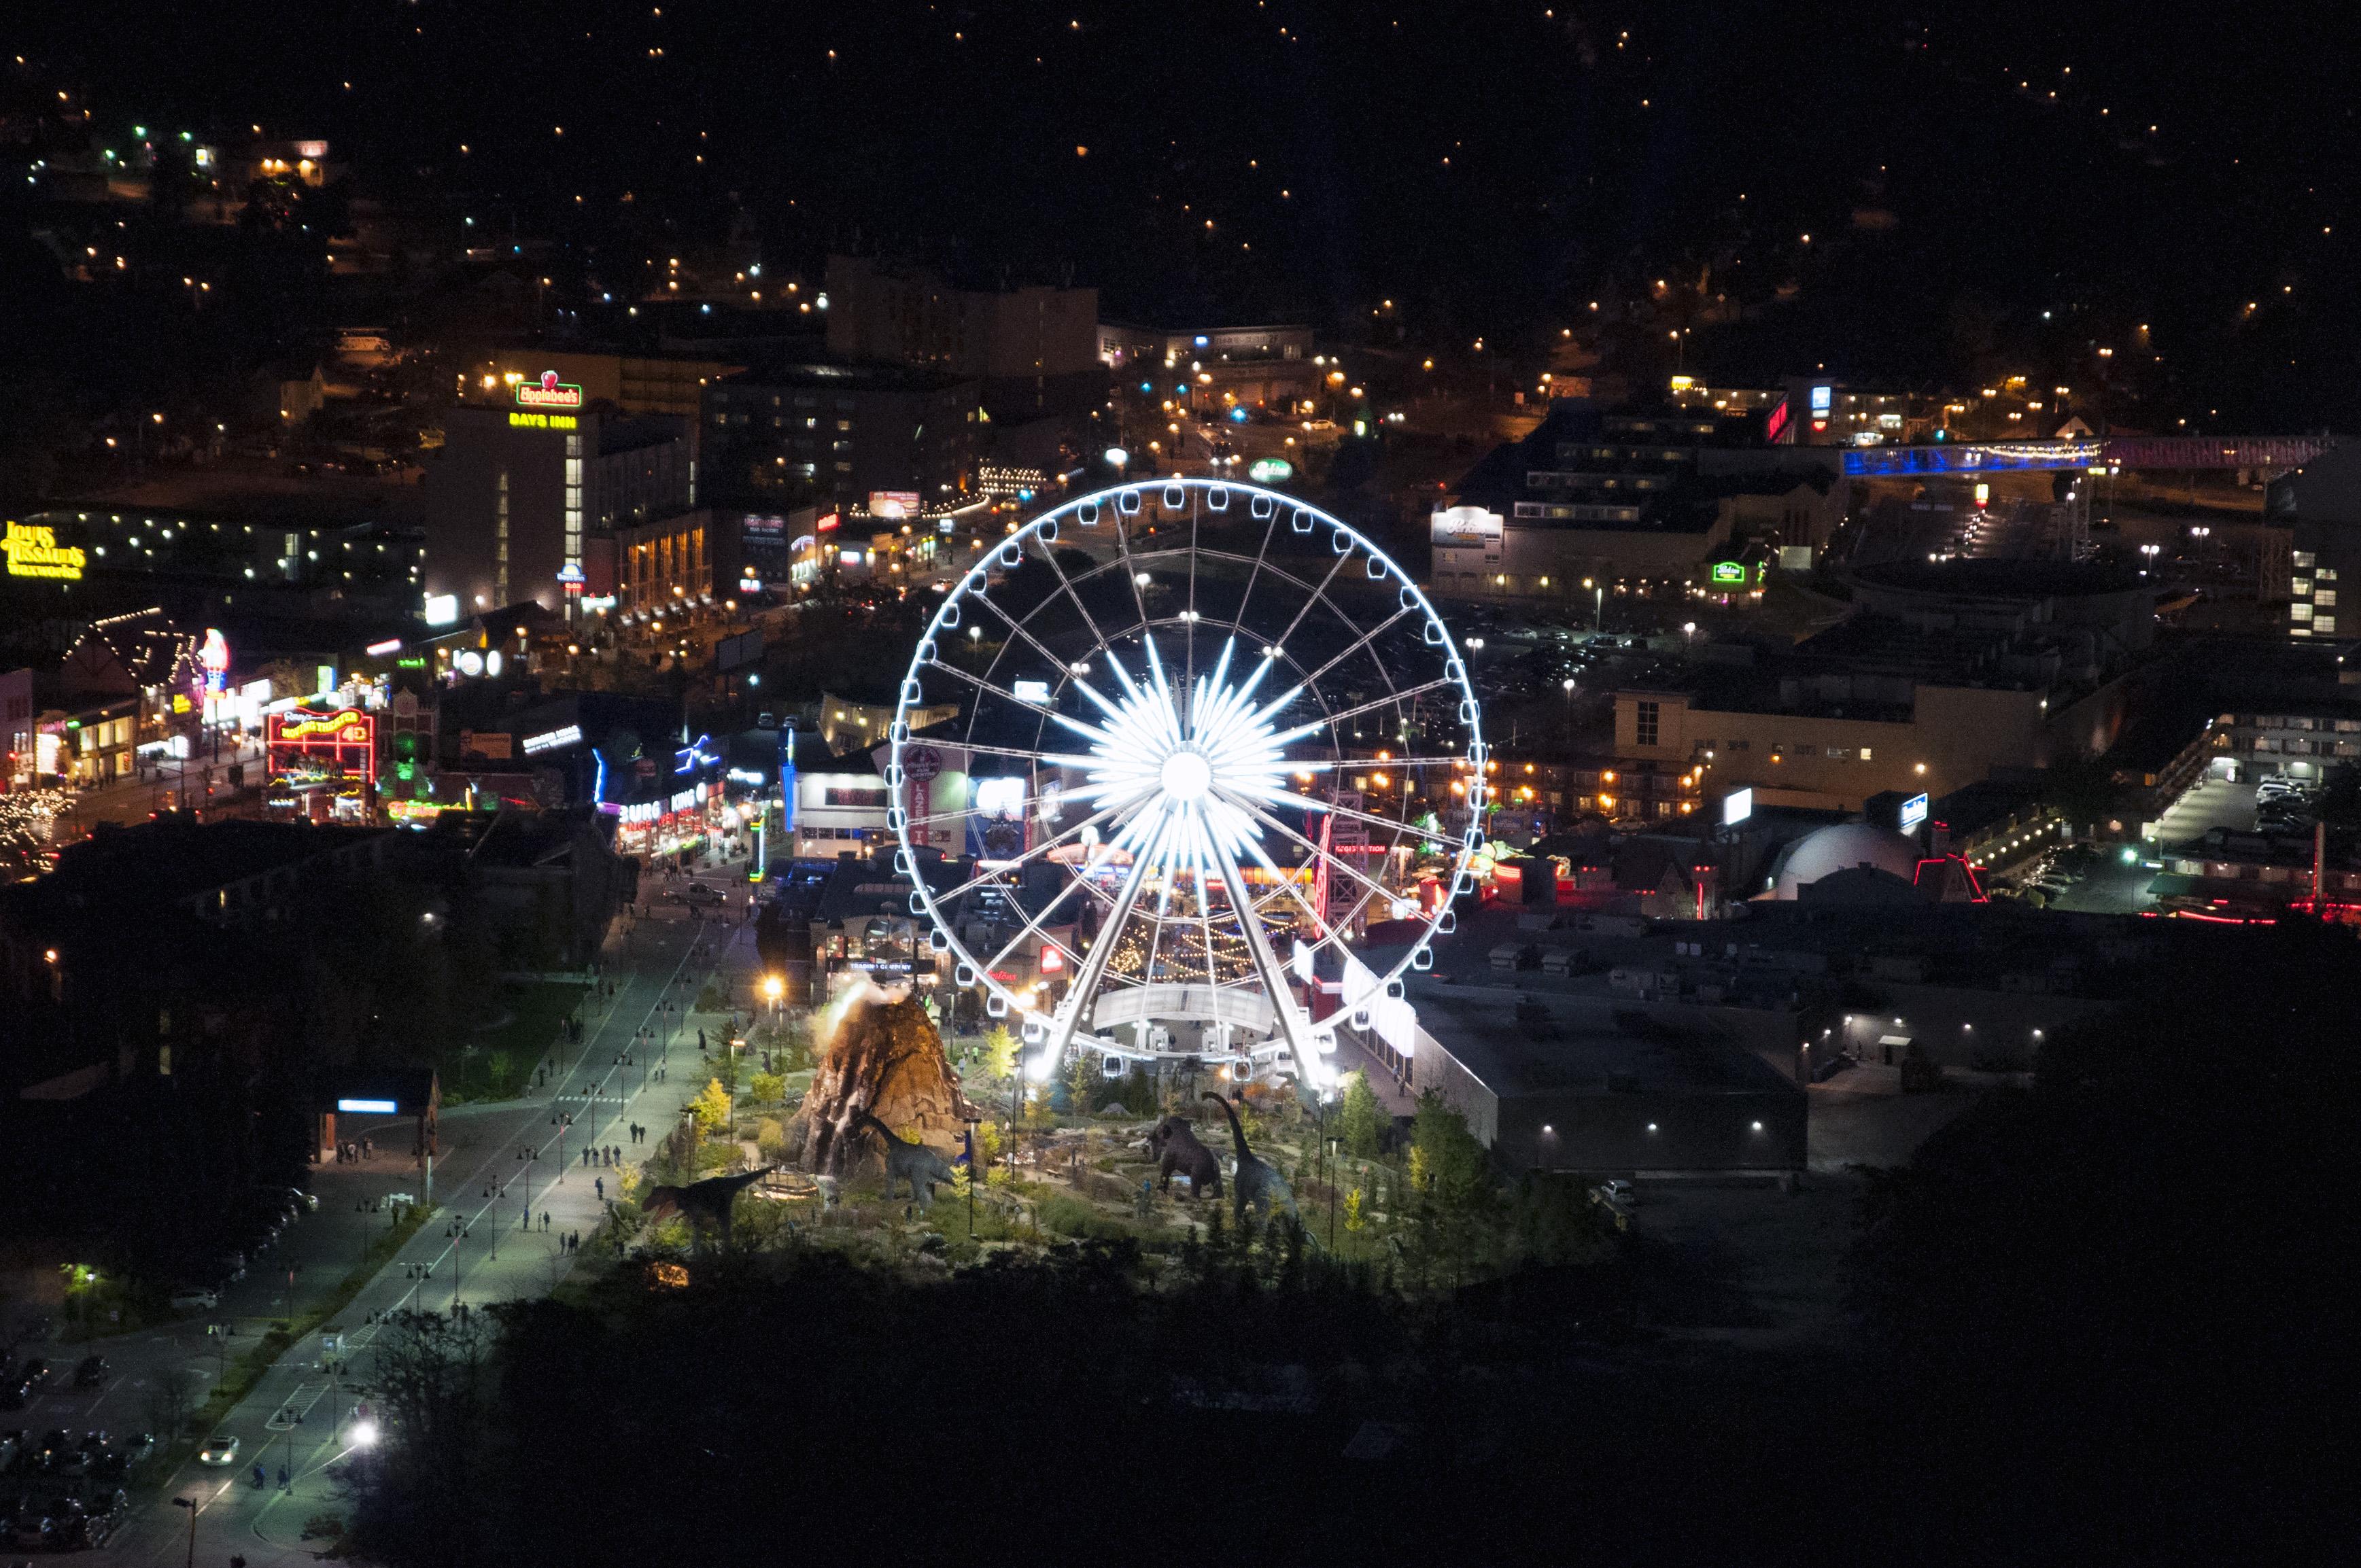 Ferris Wheel Myrtle Beach Coupon